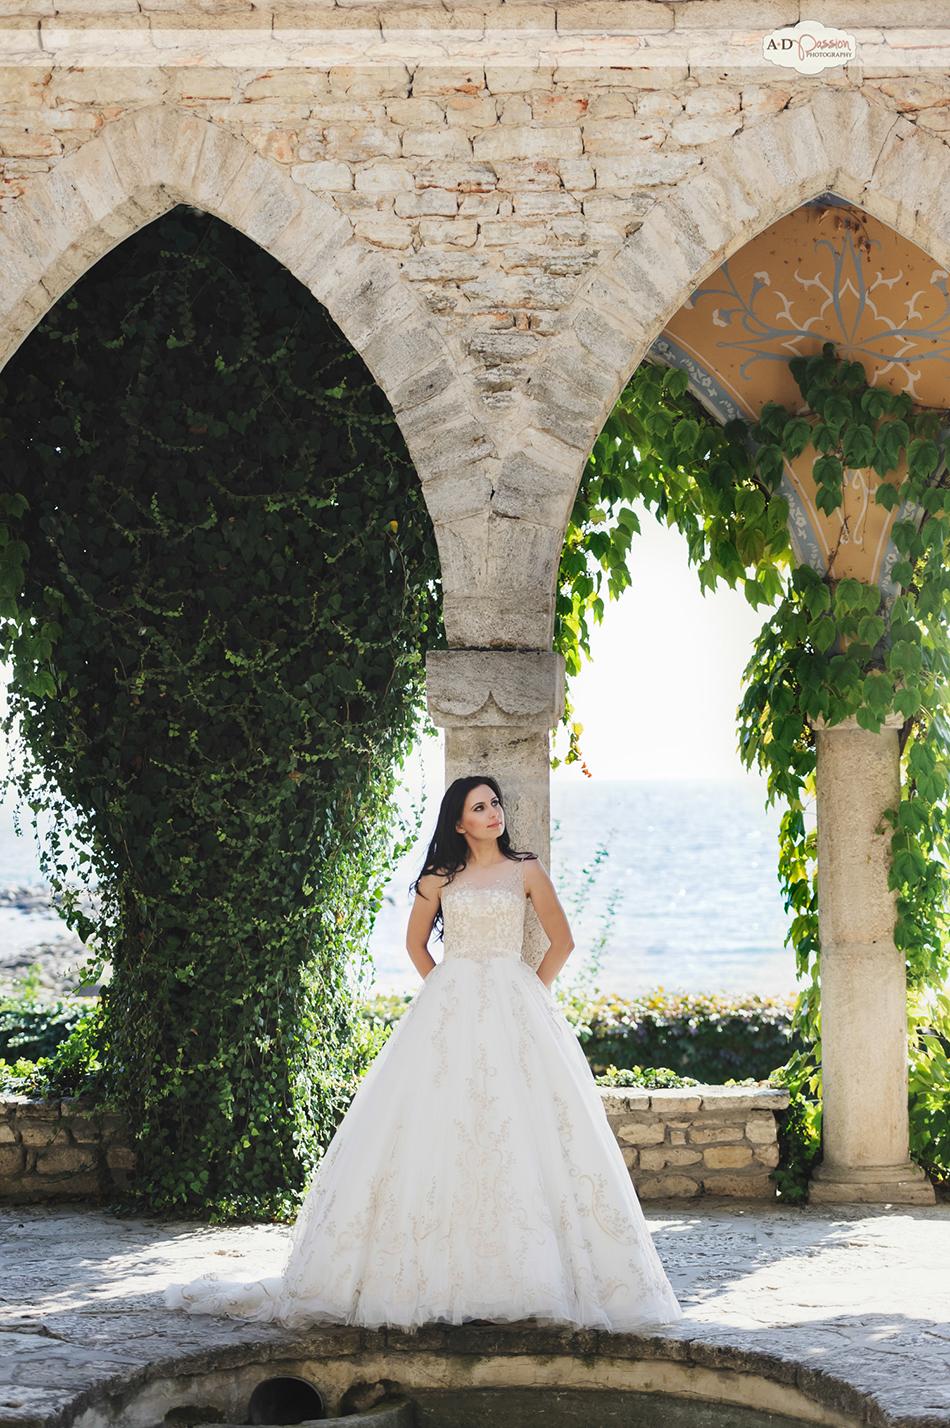 AD Passion Photography | 20131008_fotograf-nunta-profesionist_after-wedding-balchik_razvan-si-eliza_0065 | Adelin, Dida, fotograf profesionist, fotograf de nunta, fotografie de nunta, fotograf Timisoara, fotograf Craiova, fotograf Bucuresti, fotograf Arad, nunta Timisoara, nunta Arad, nunta Bucuresti, nunta Craiova